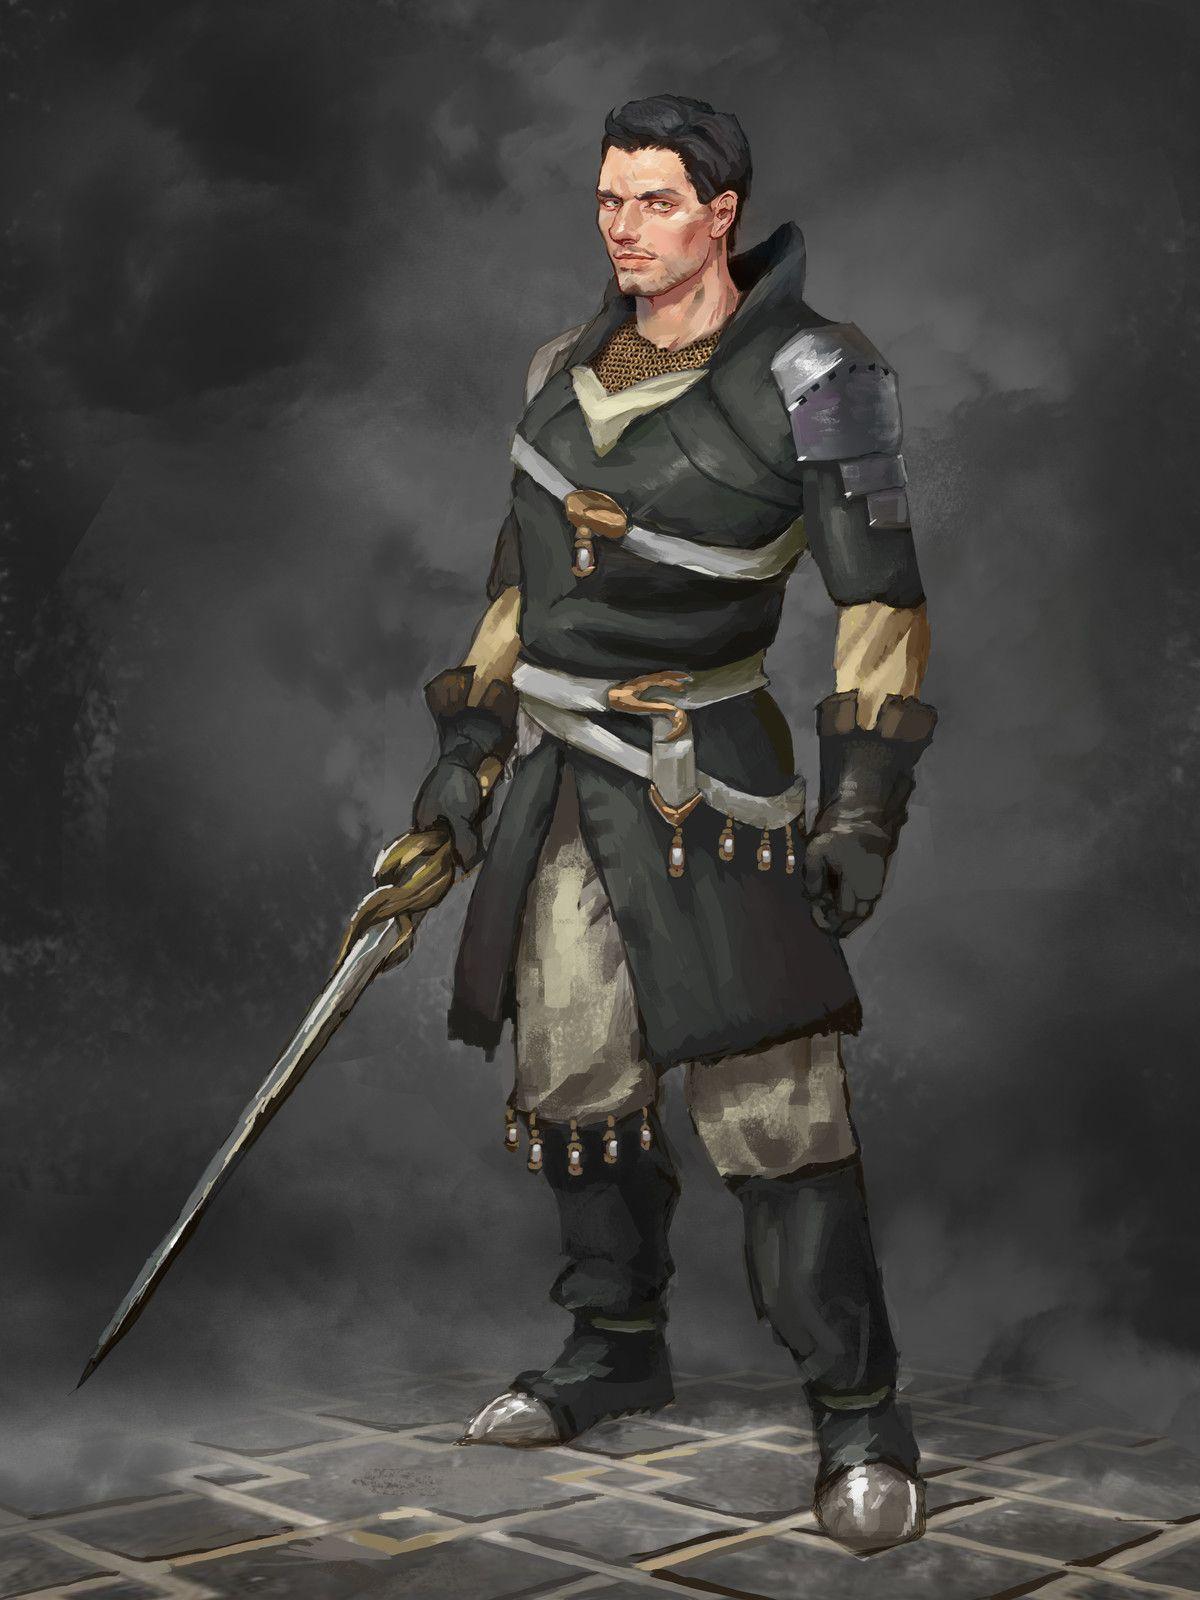 Serpent Tracker, Andrew Ryan on ArtStation at https://www.artstation.com/artwork/855PQ